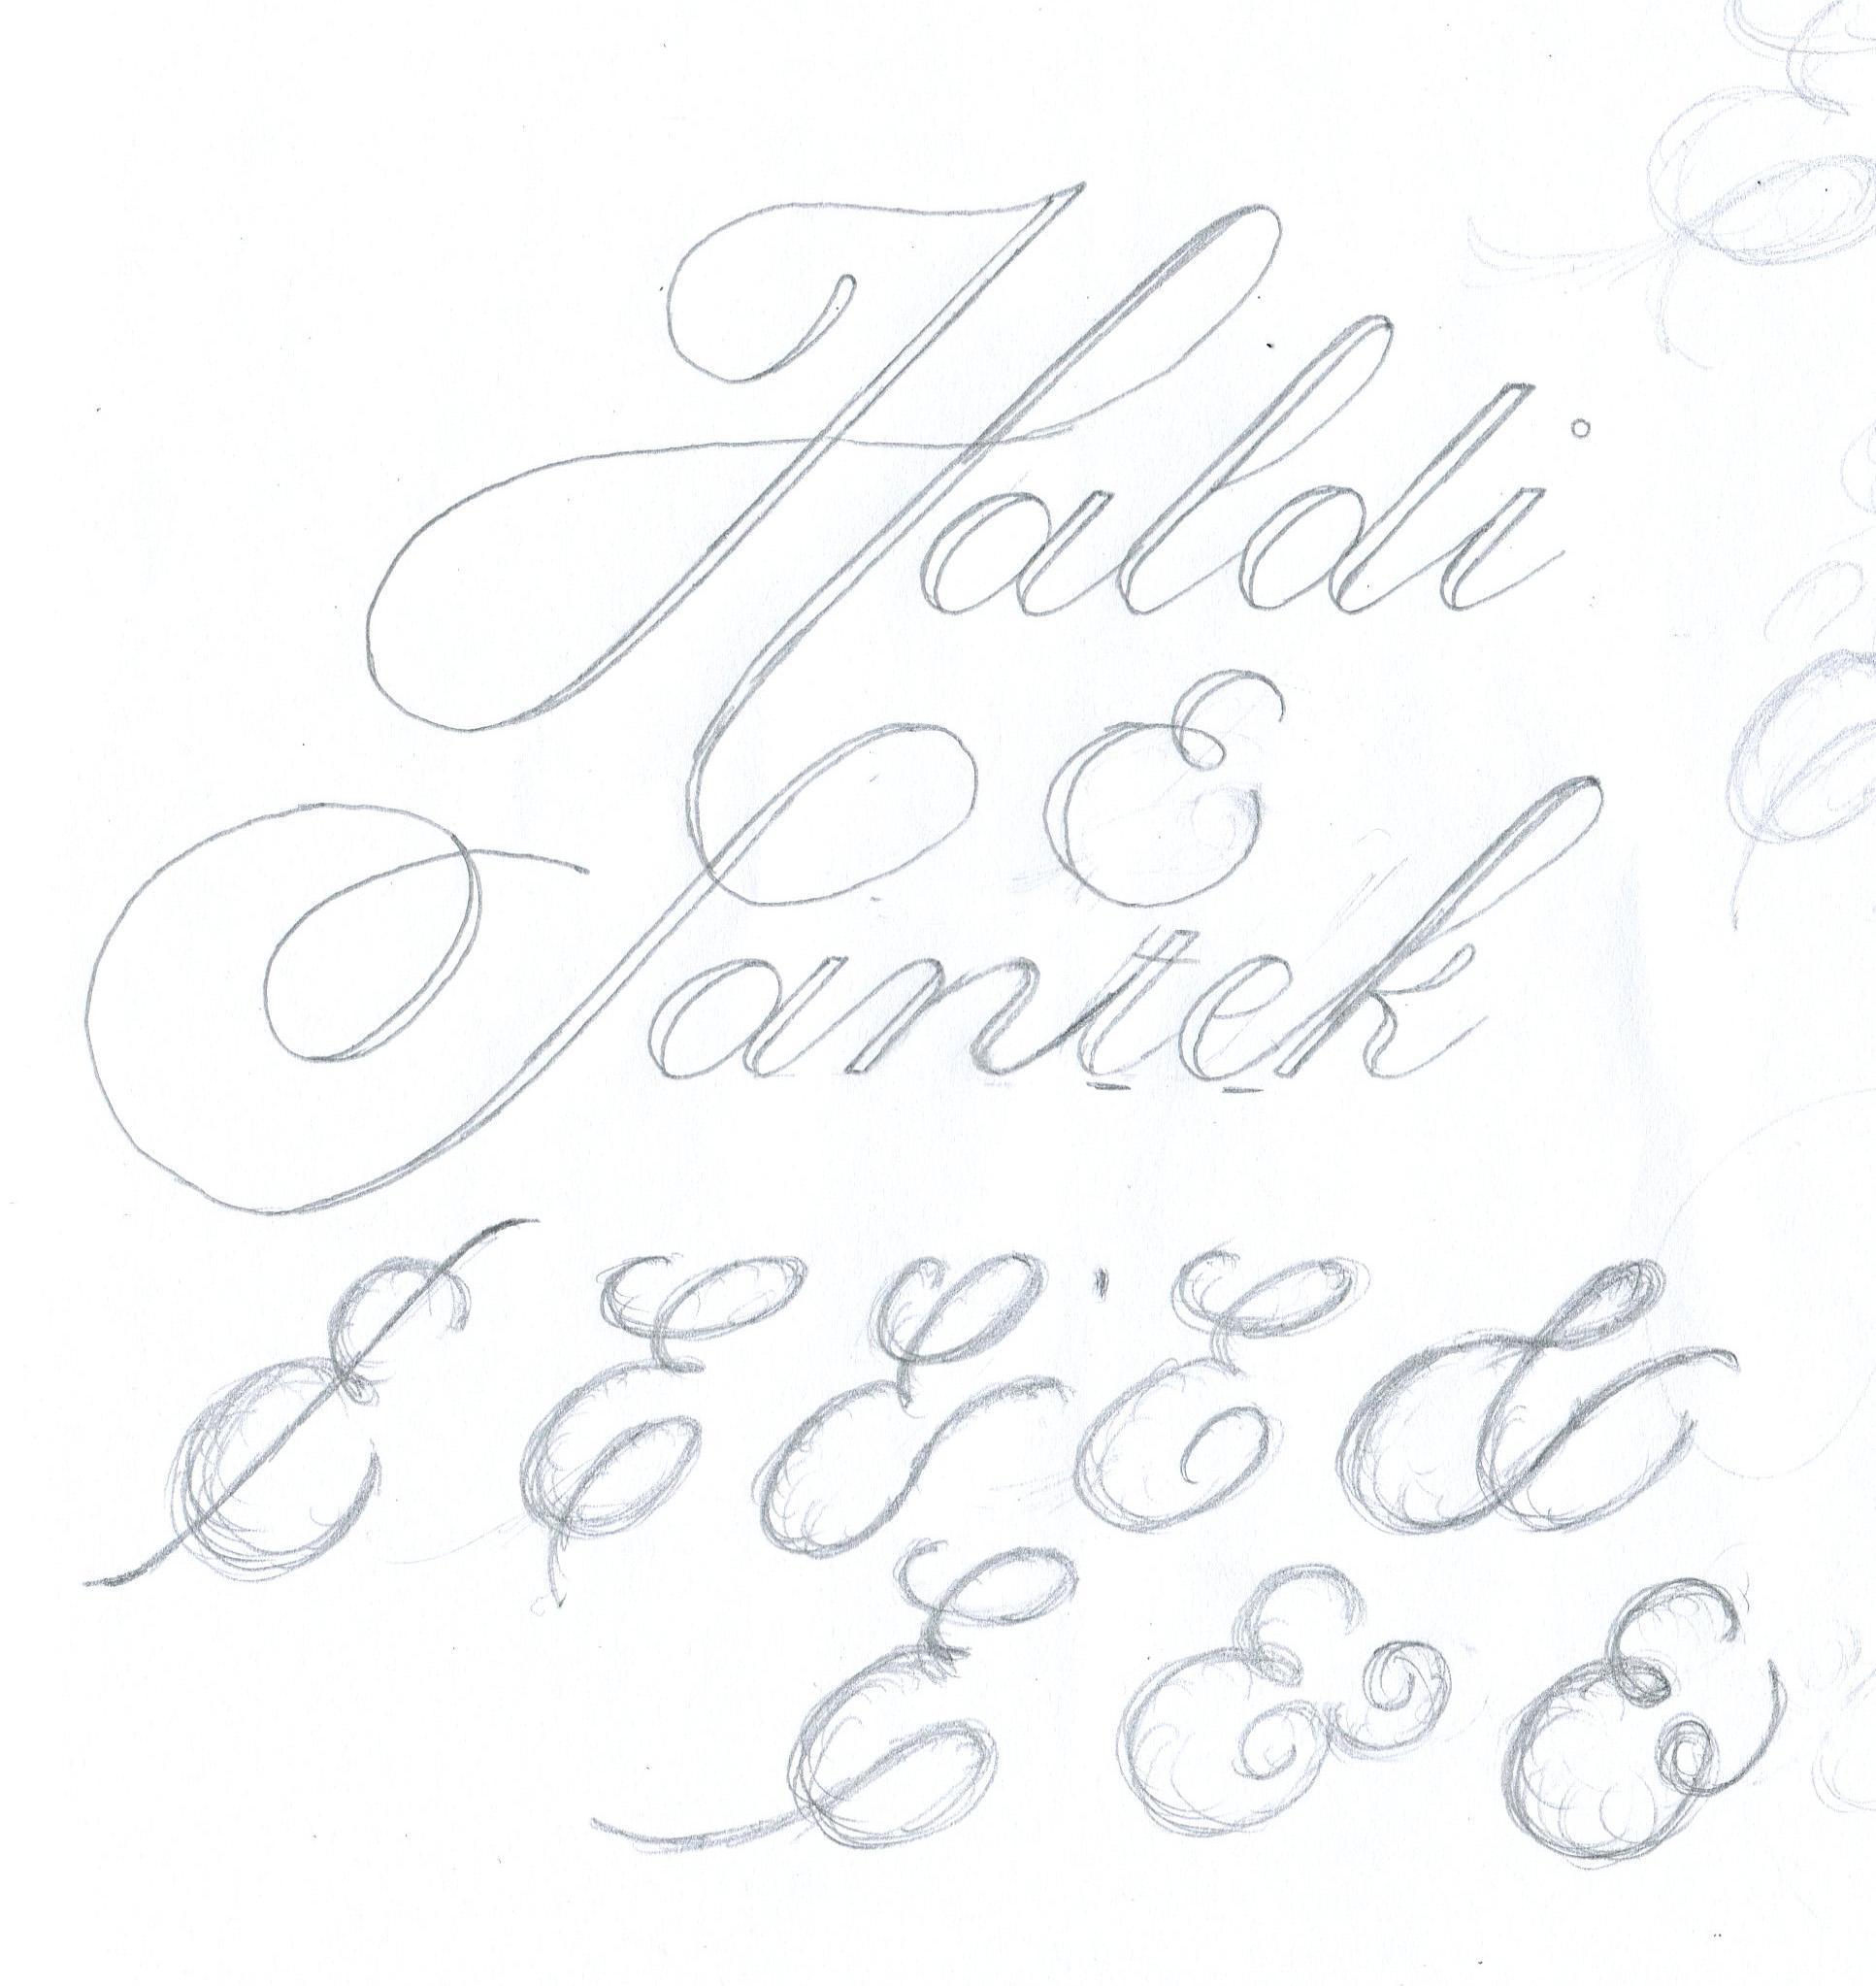 Haldi & Santek - image 6 - student project